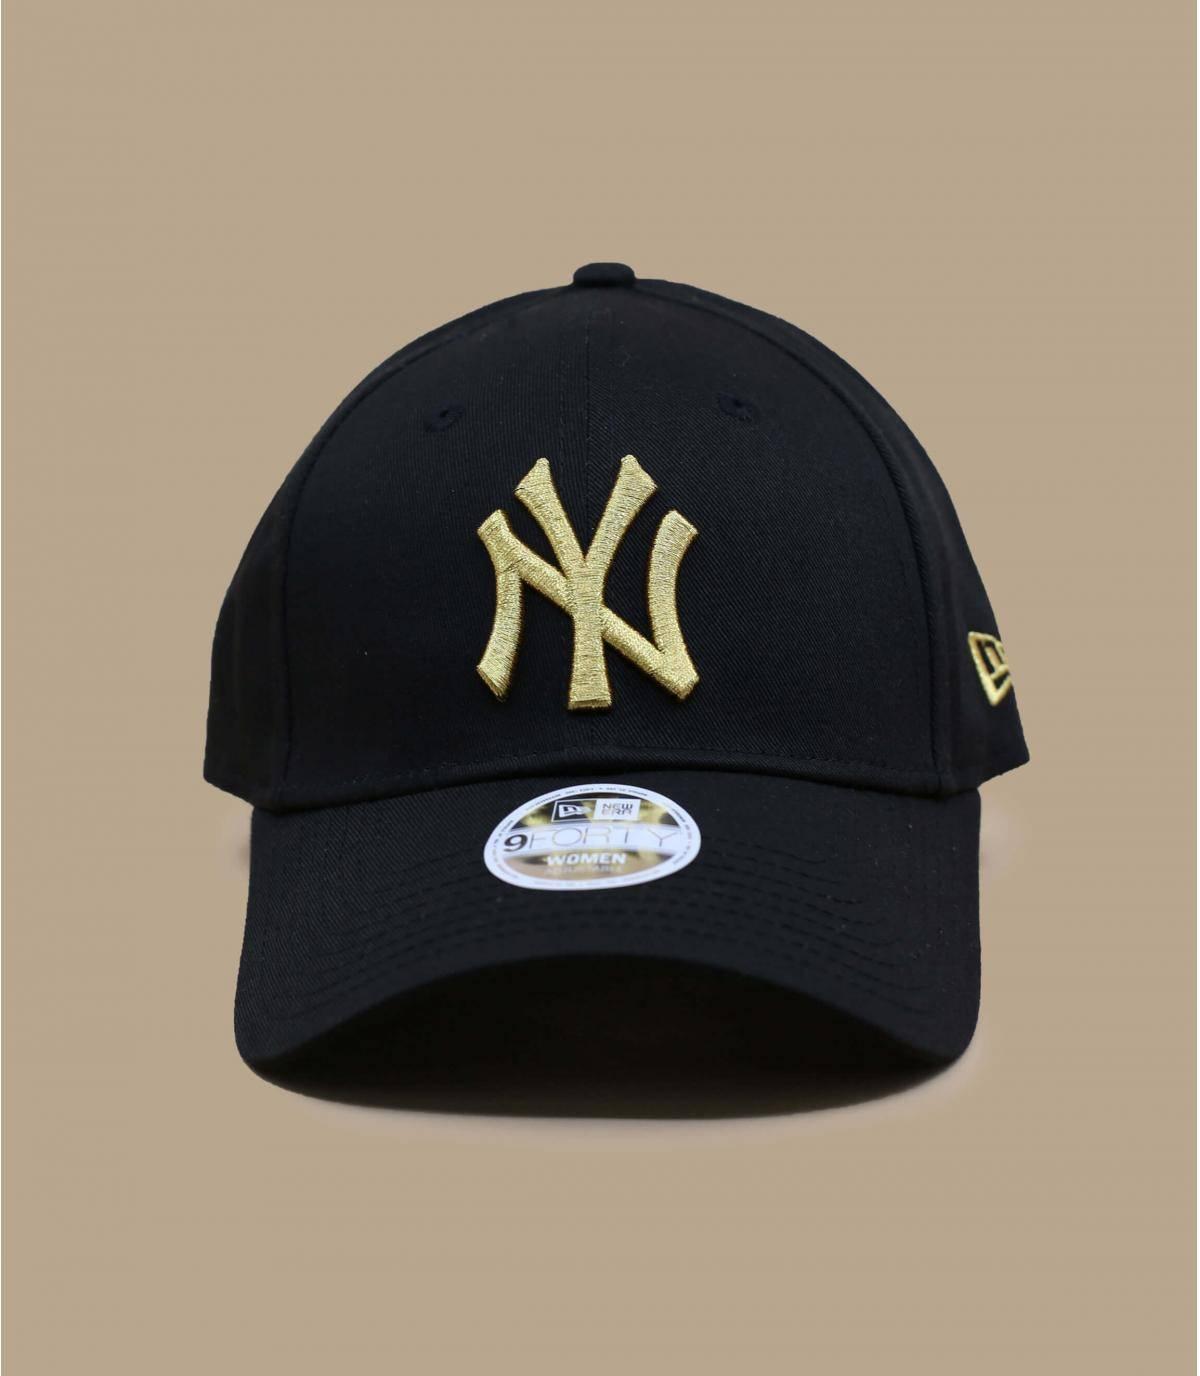 Details Wmns Metallic 940 NY black gold - afbeeling 2